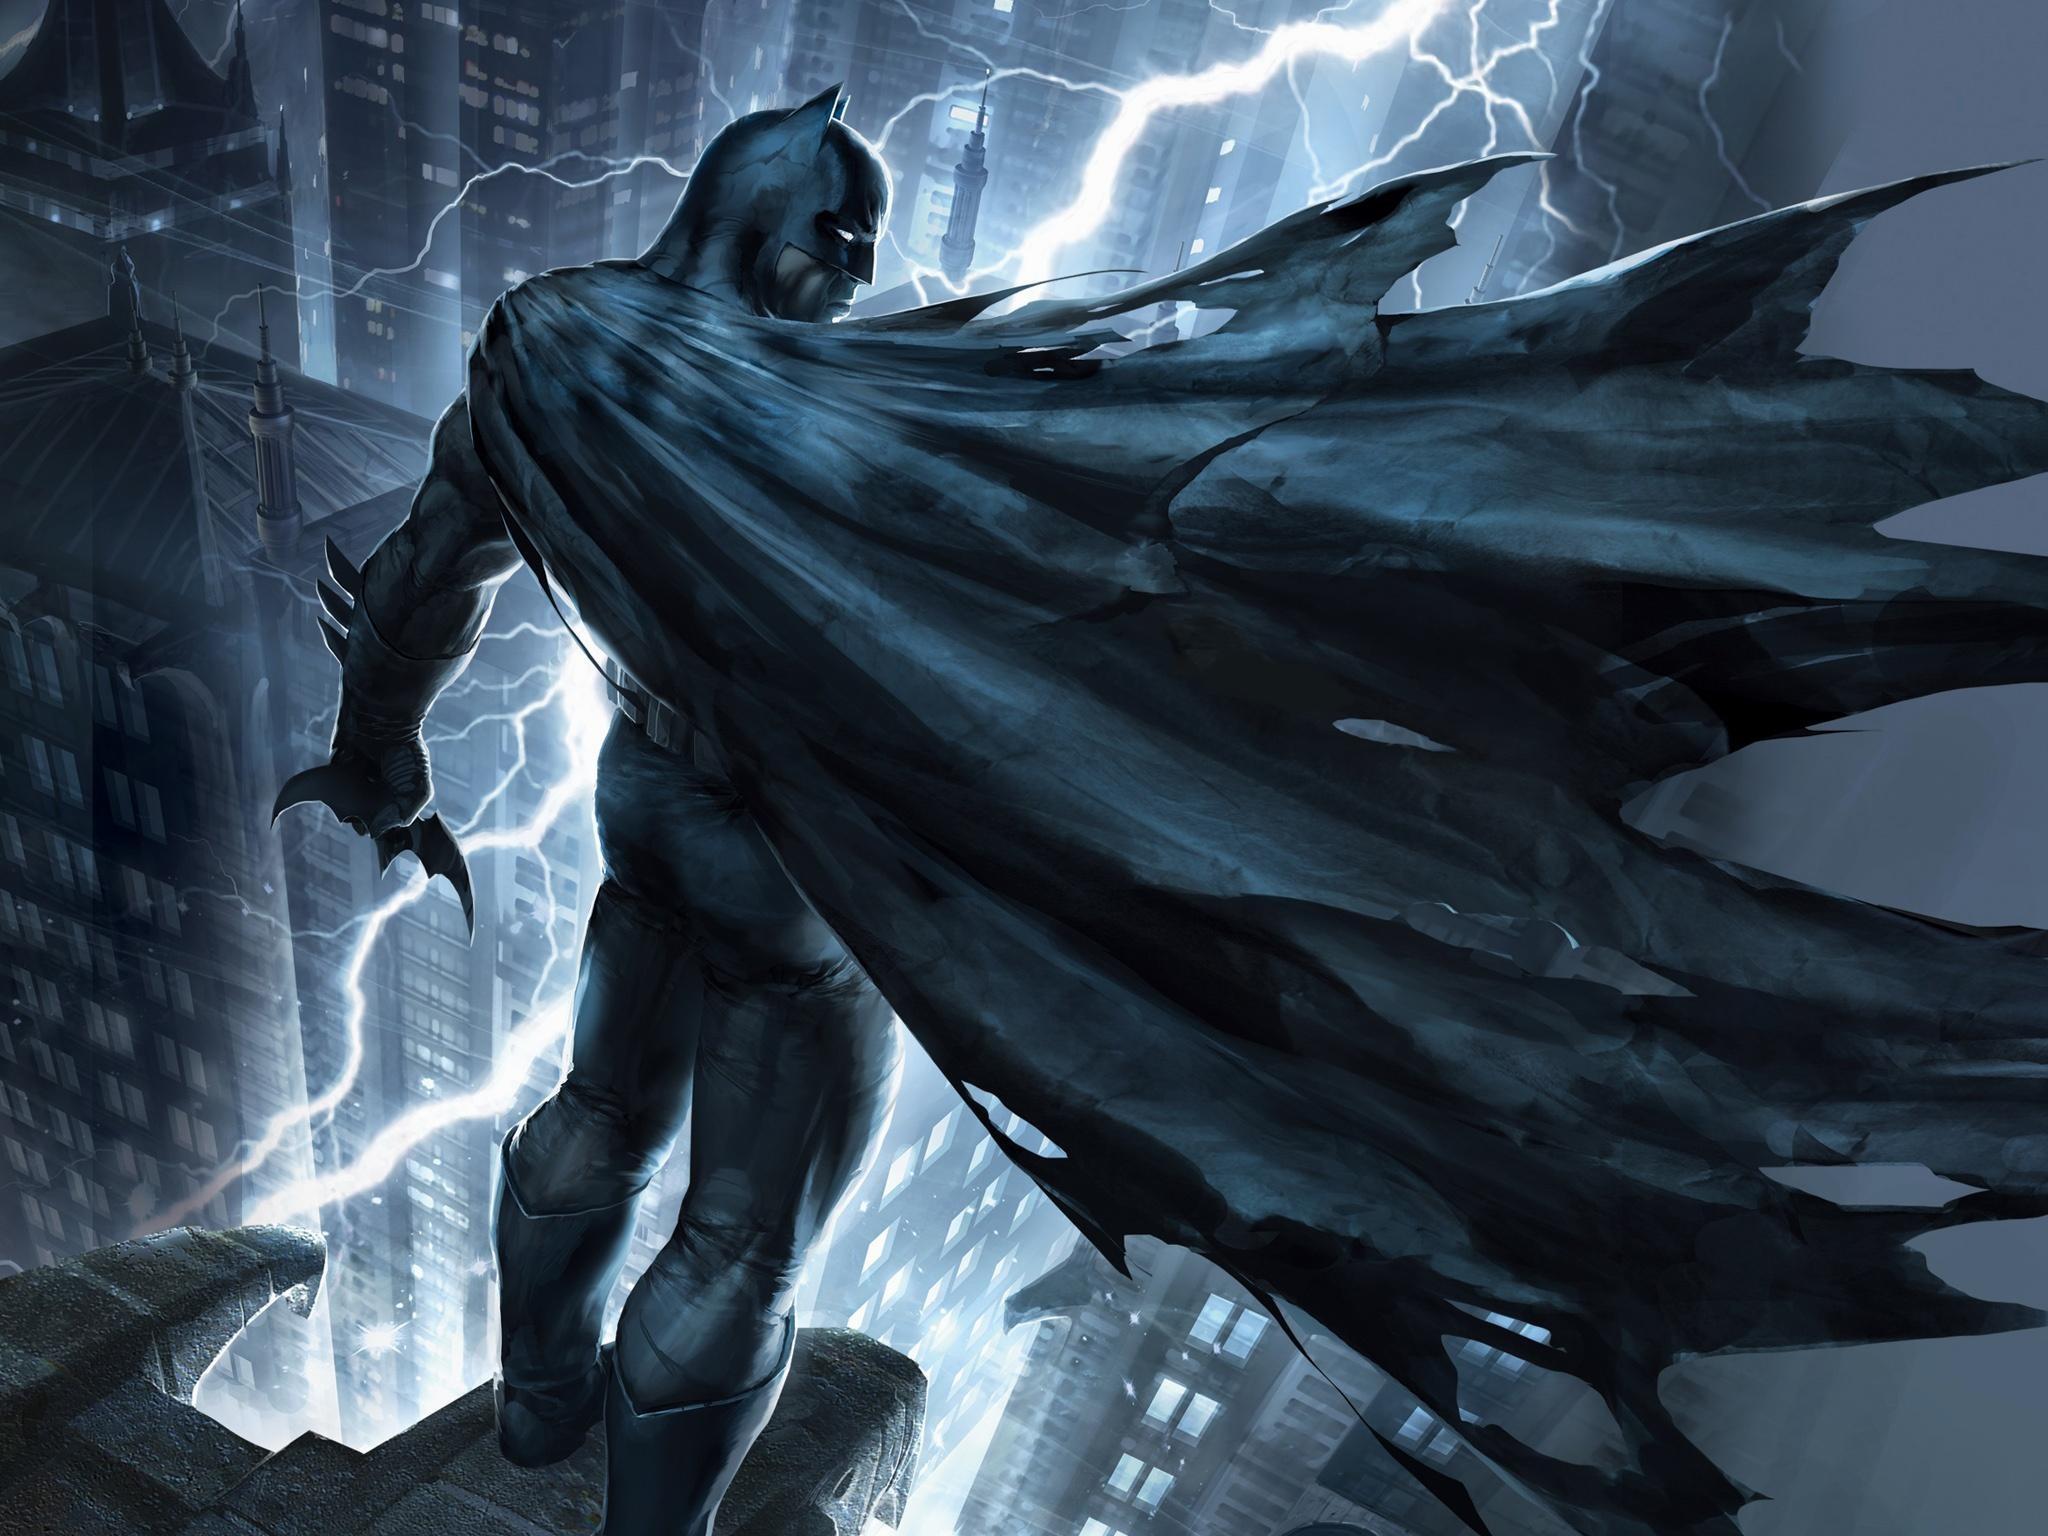 Batman HD wallpaper ·① Download free High Resolution ...